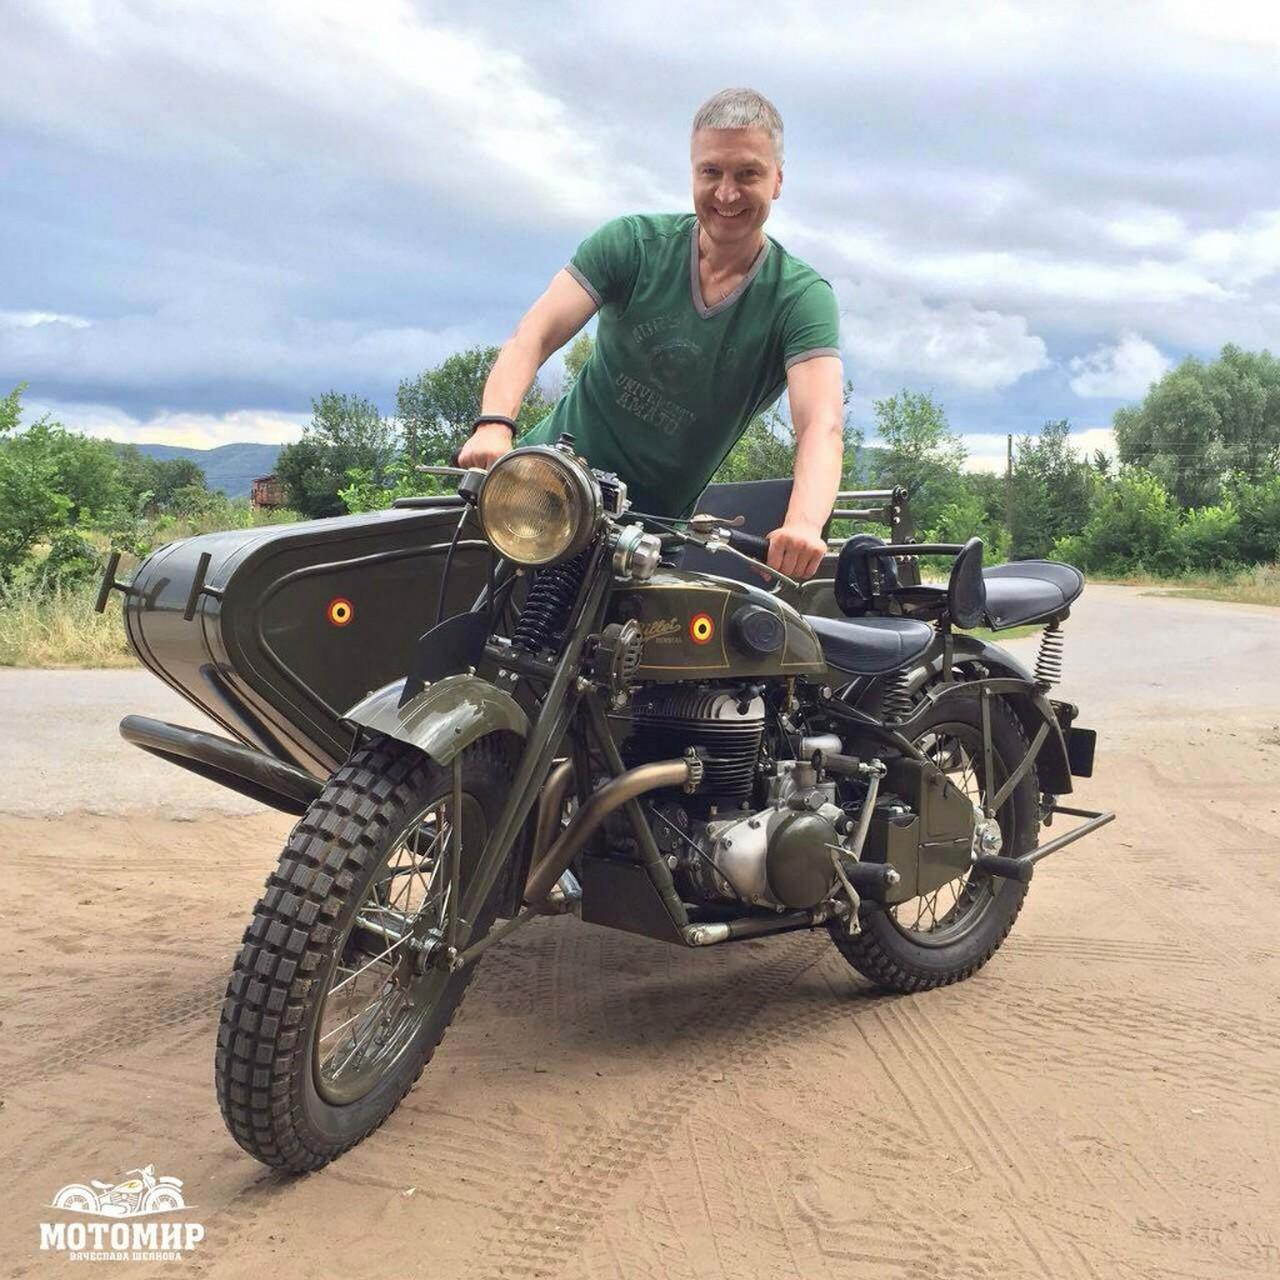 mototourism-memories-web-16